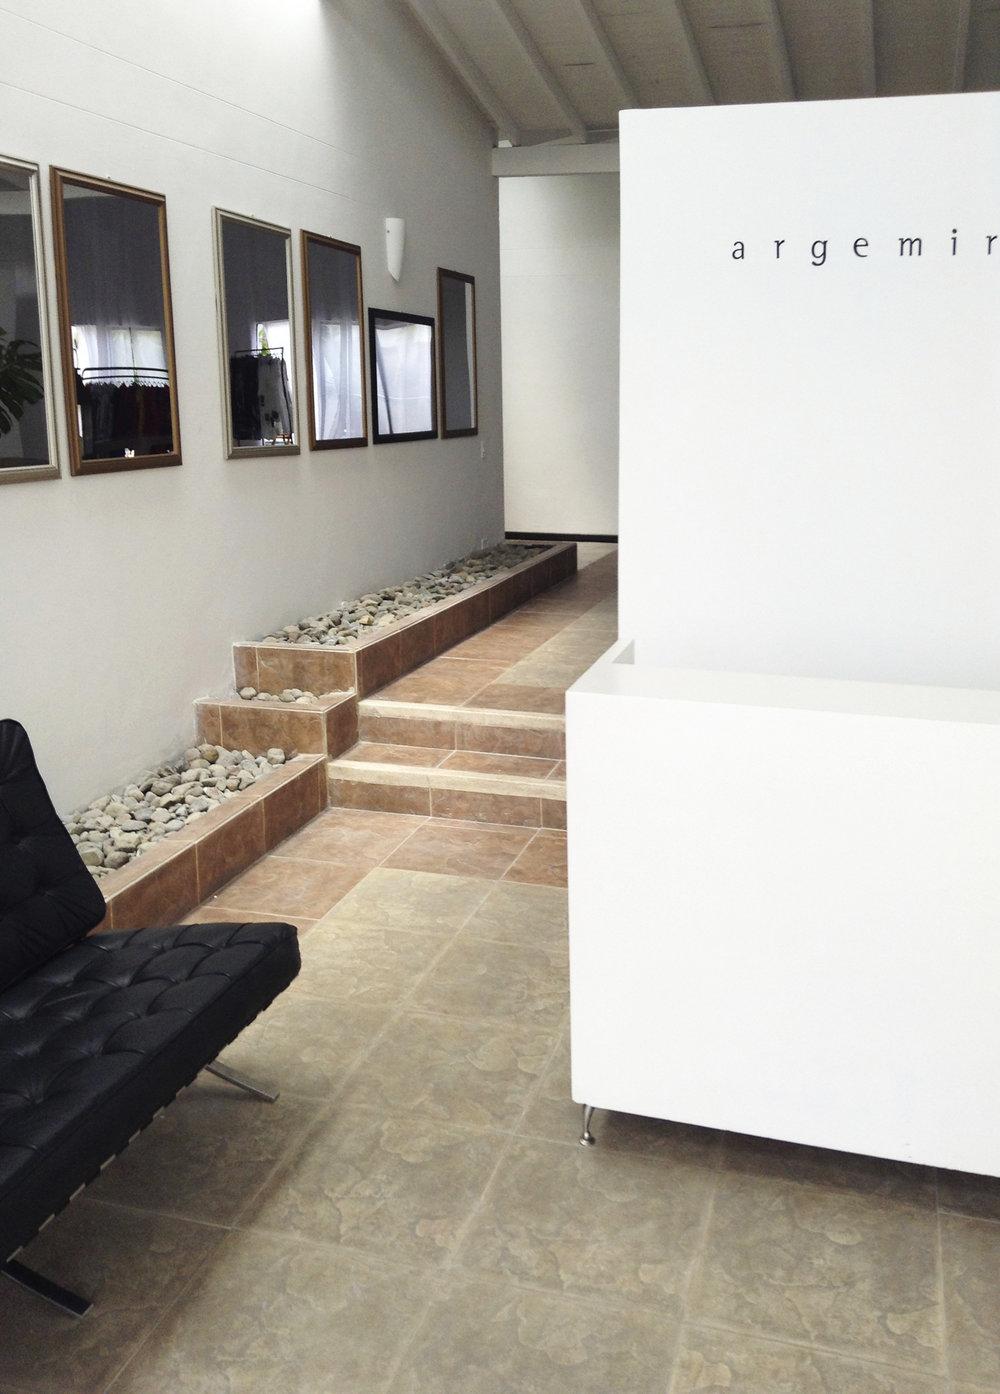 lorebui_argemiro_sierra_UX_Design.jpg